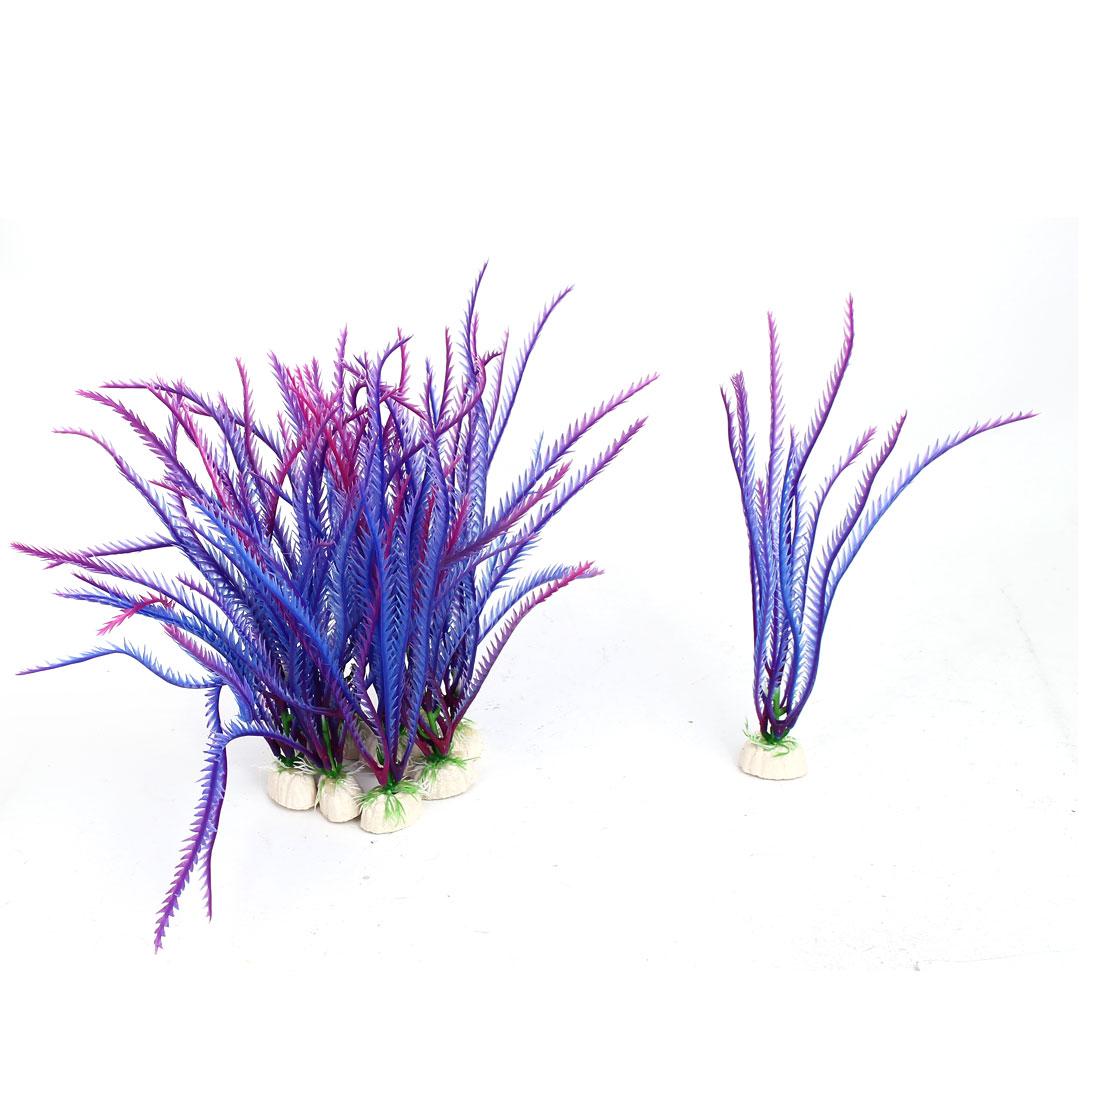 Aquarium Fish Tank Artificial Fake Water Plant Grass Decor Ornament Purple 10Pcs